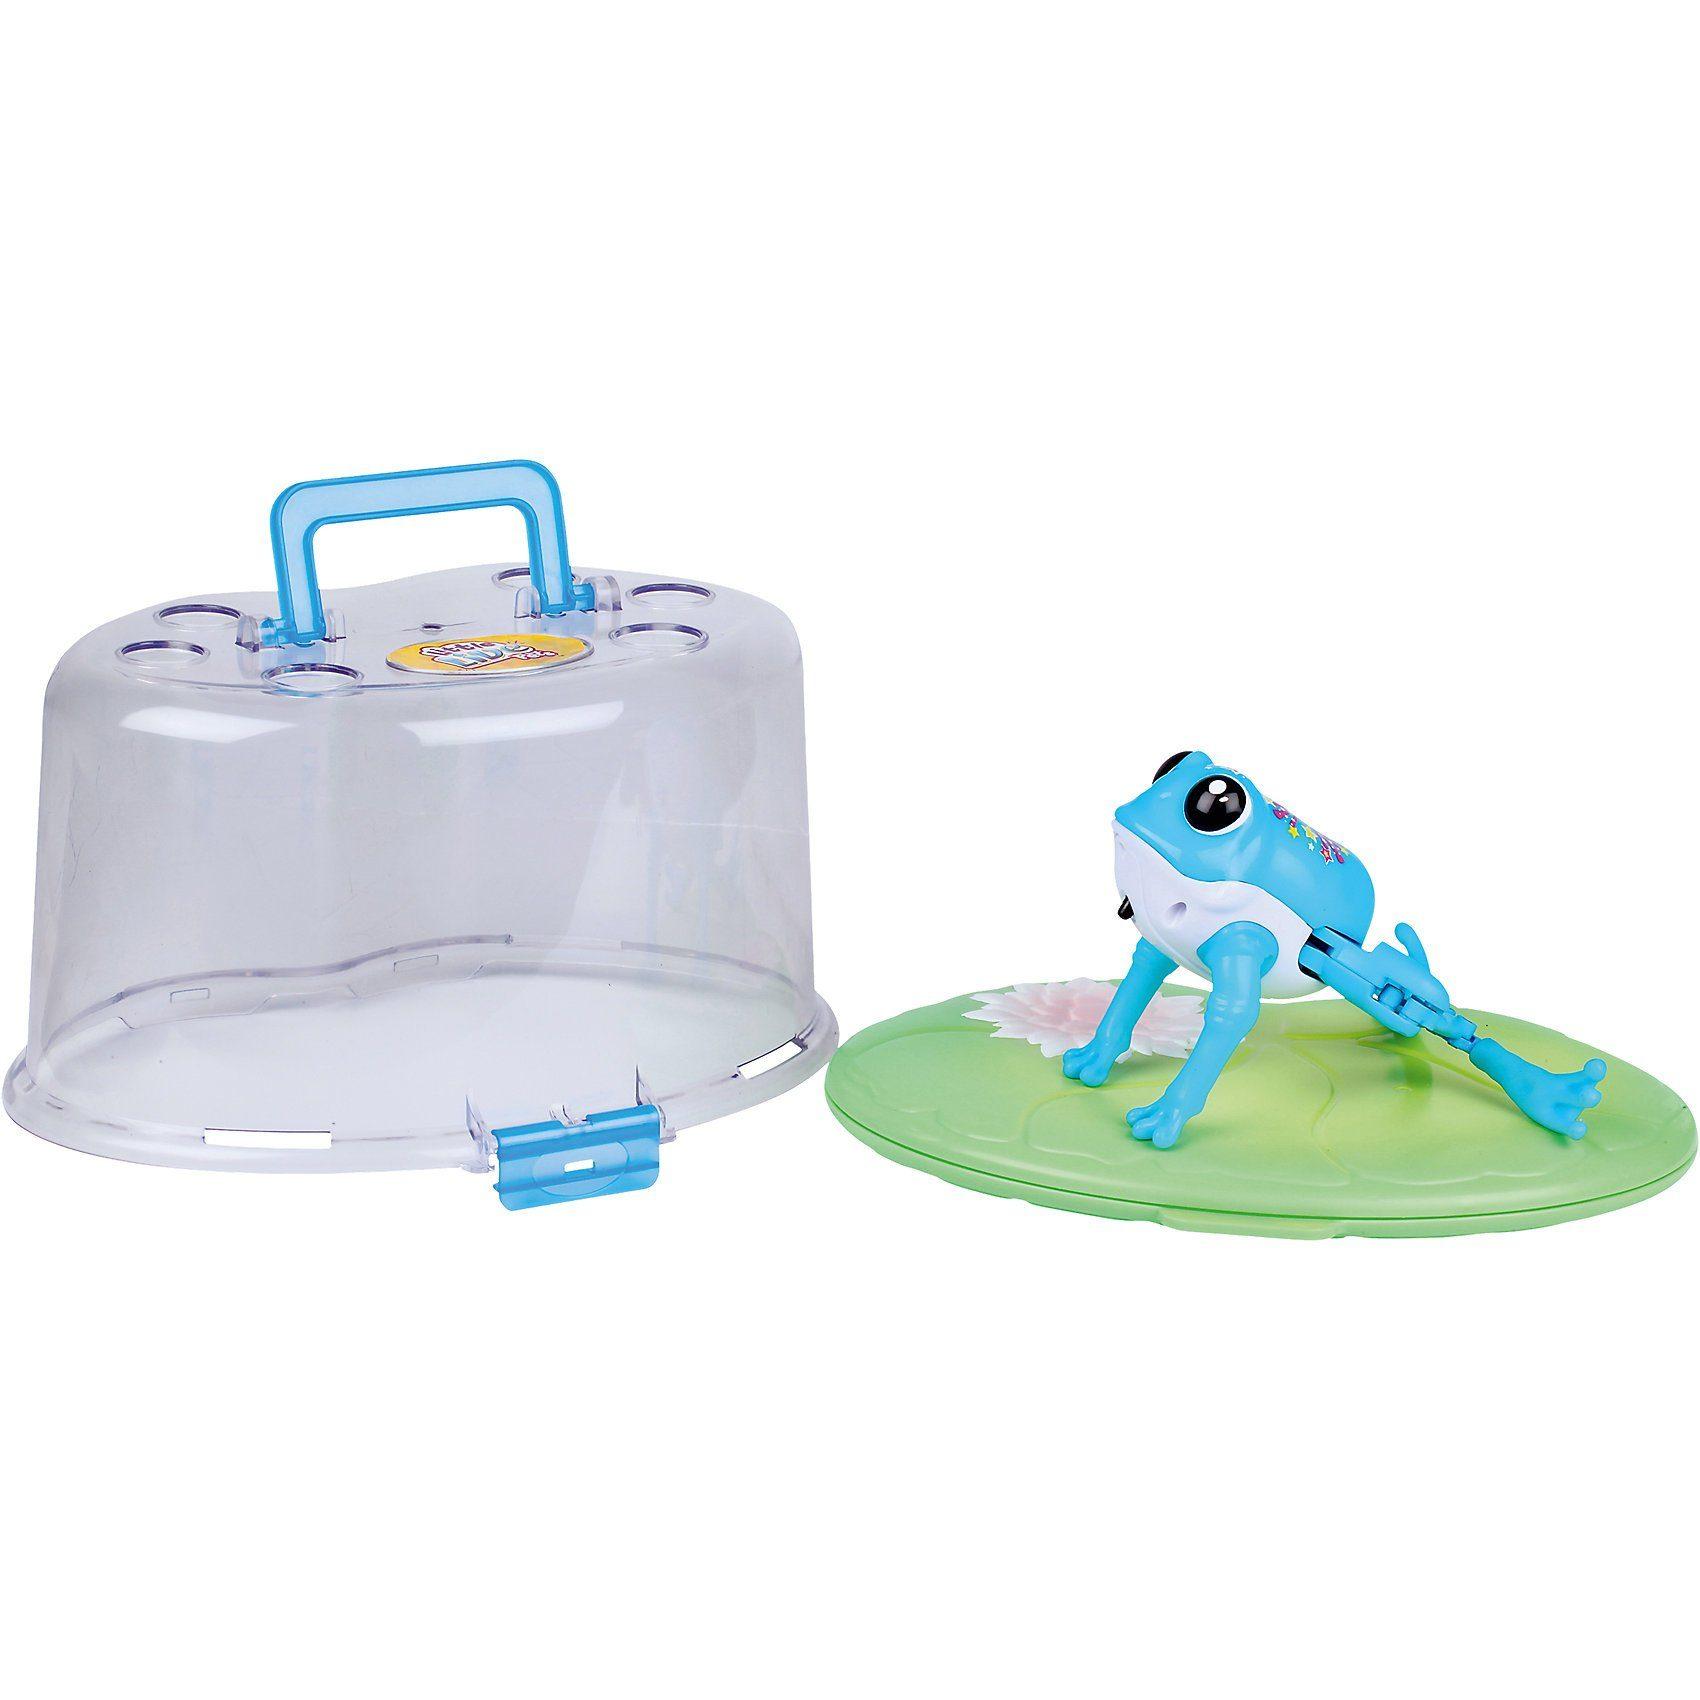 BOTI Little Live Pets Frosch mit Terrarium